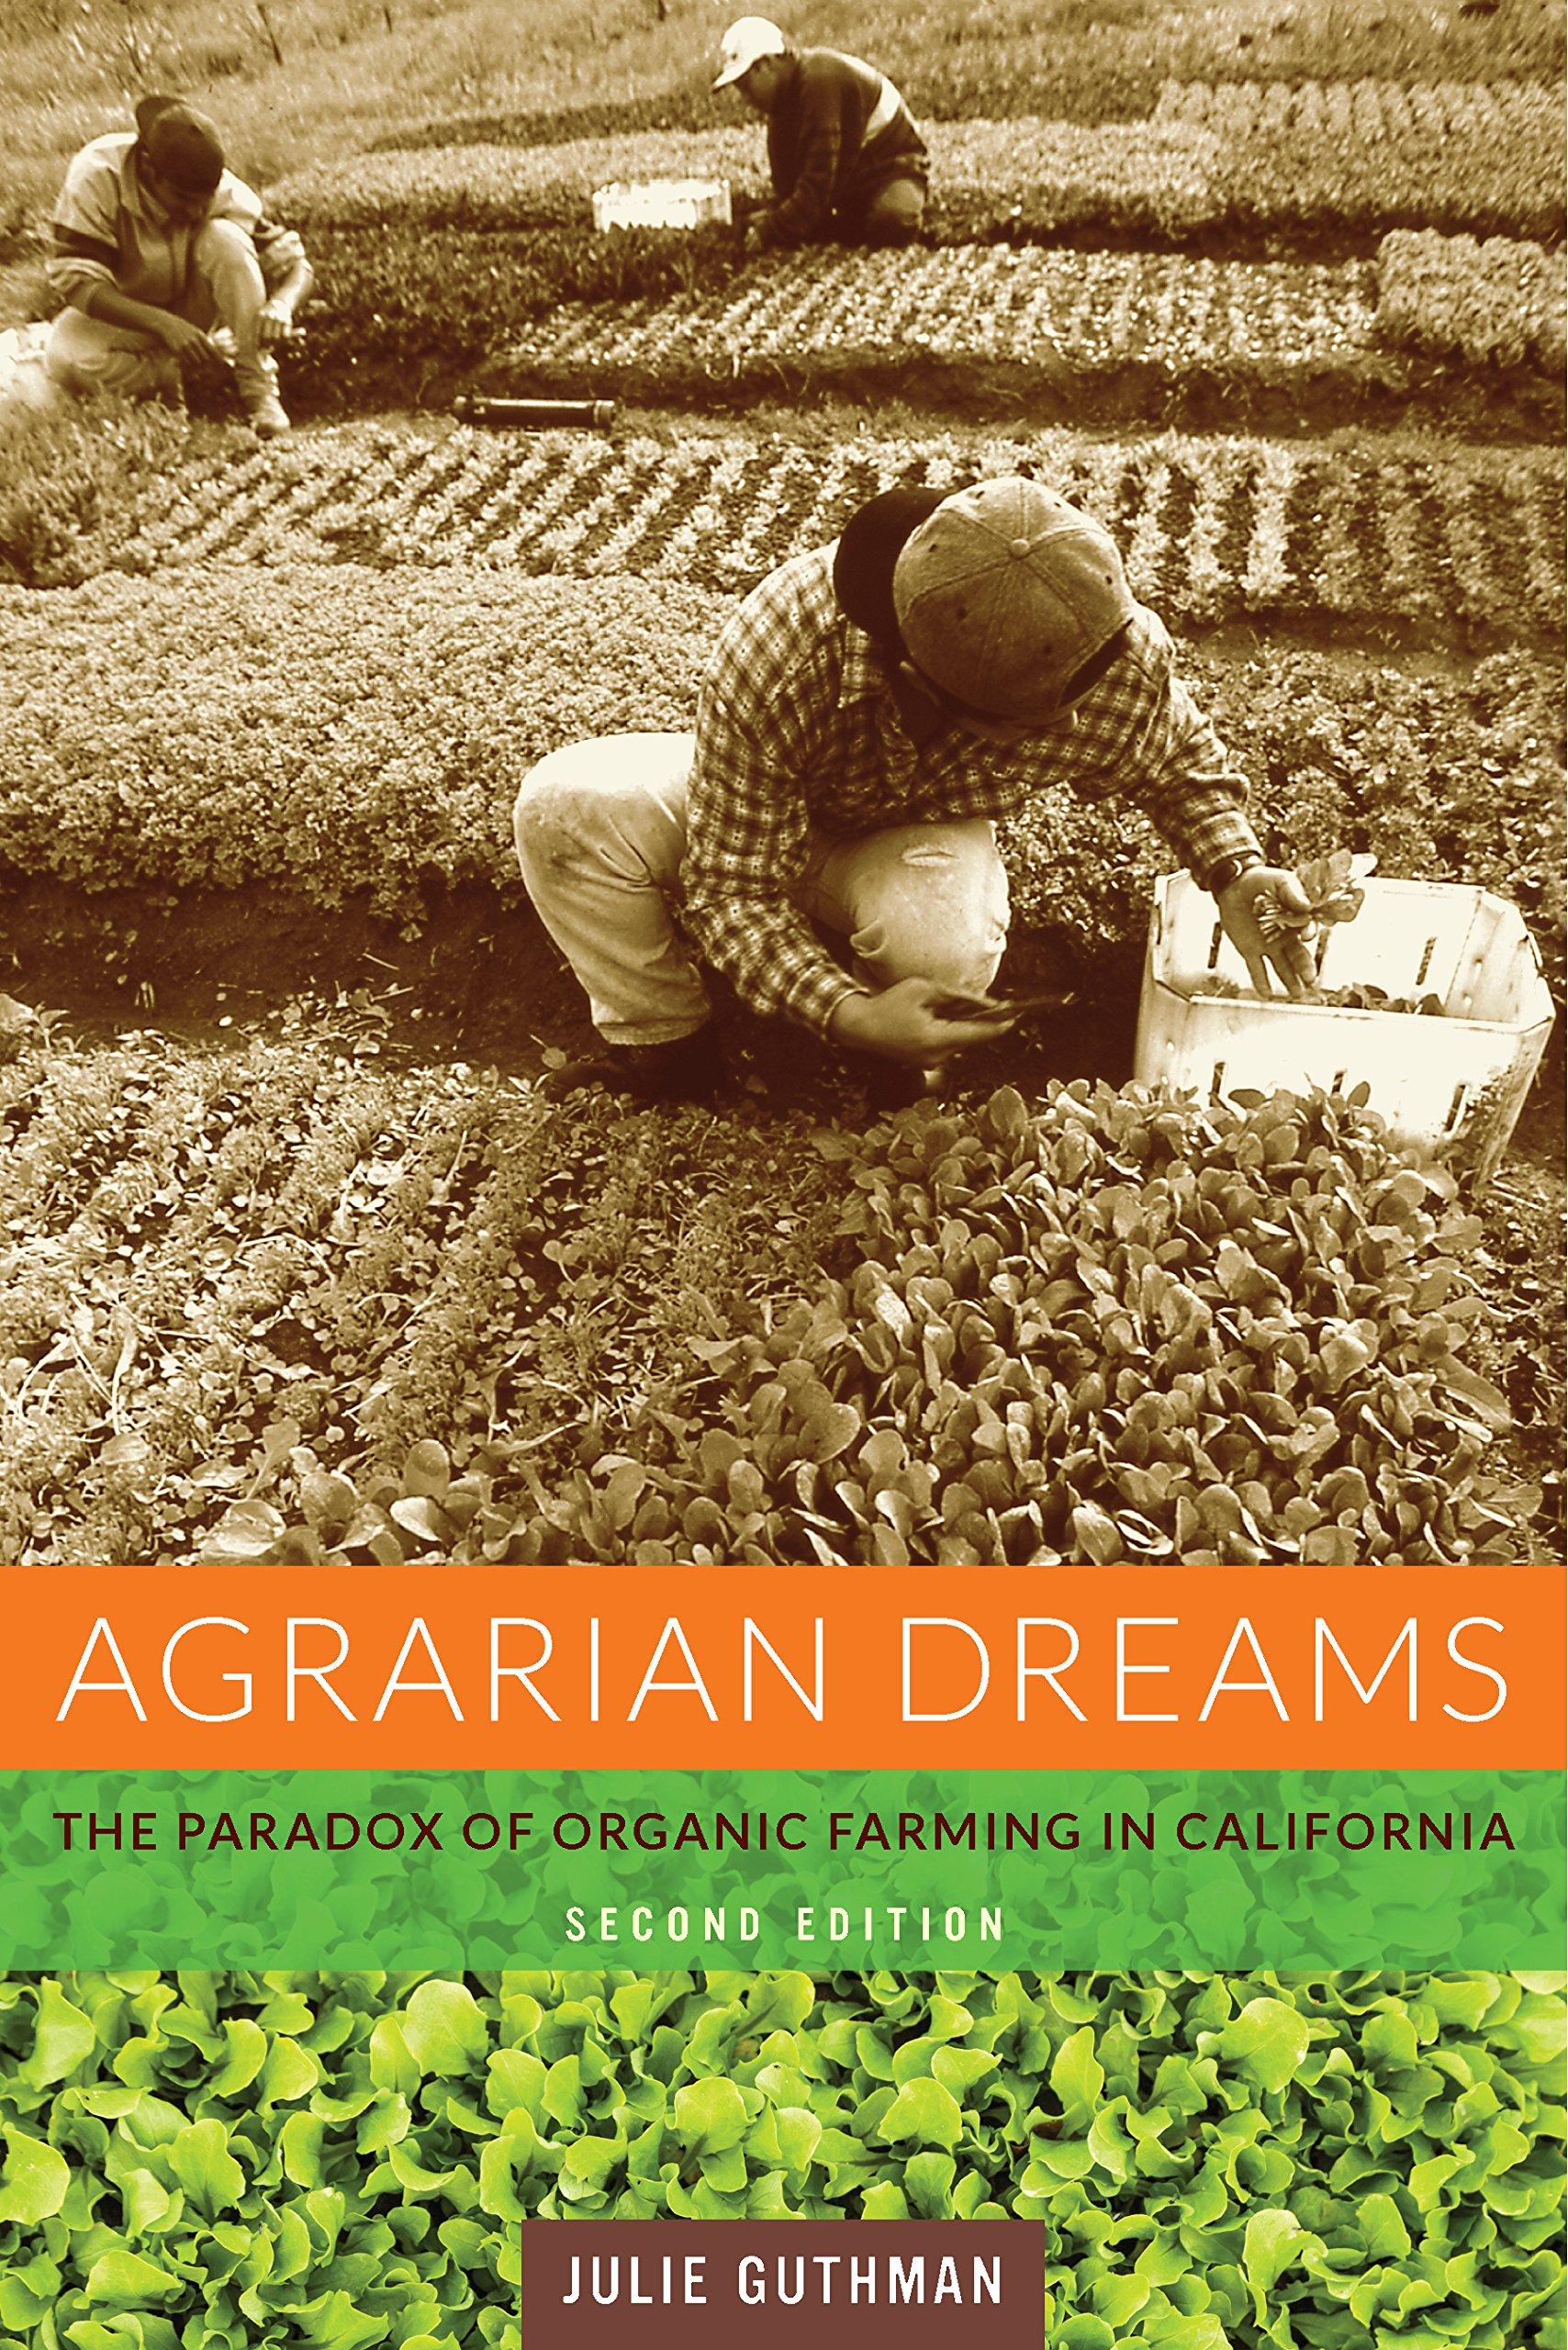 Agrarian Dreams: The Paradox of Organic Farming in California (California Studies in Critical Human Geography Book 11)